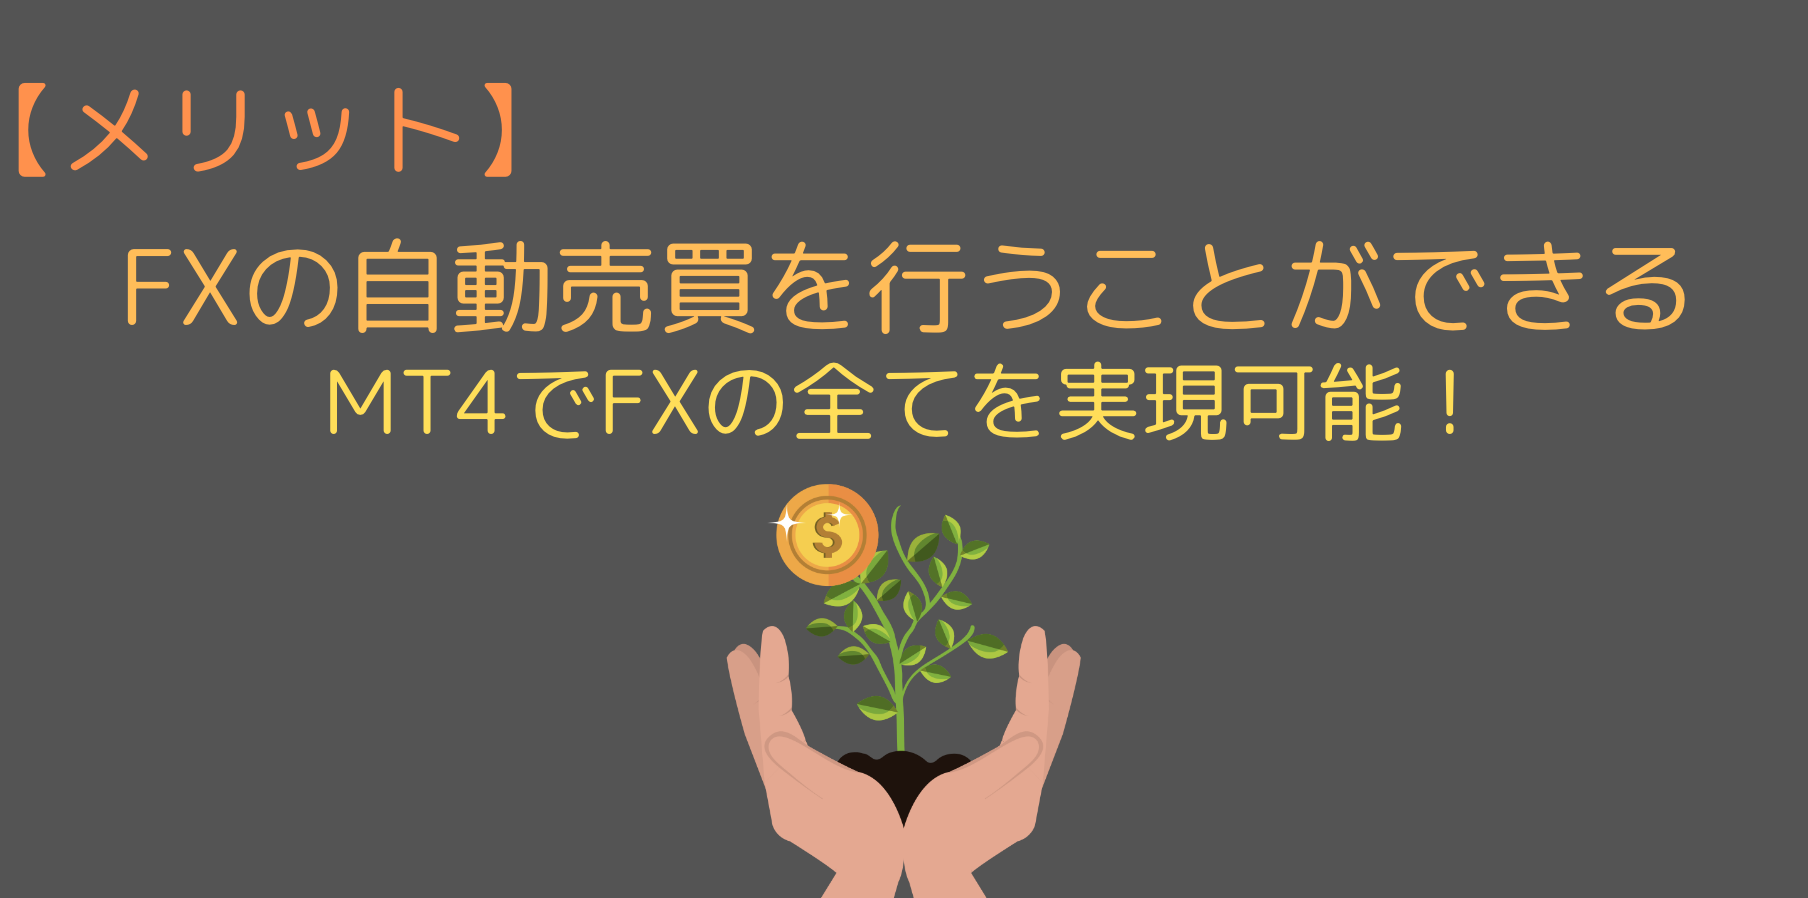 FXの自動売買を行うことができる